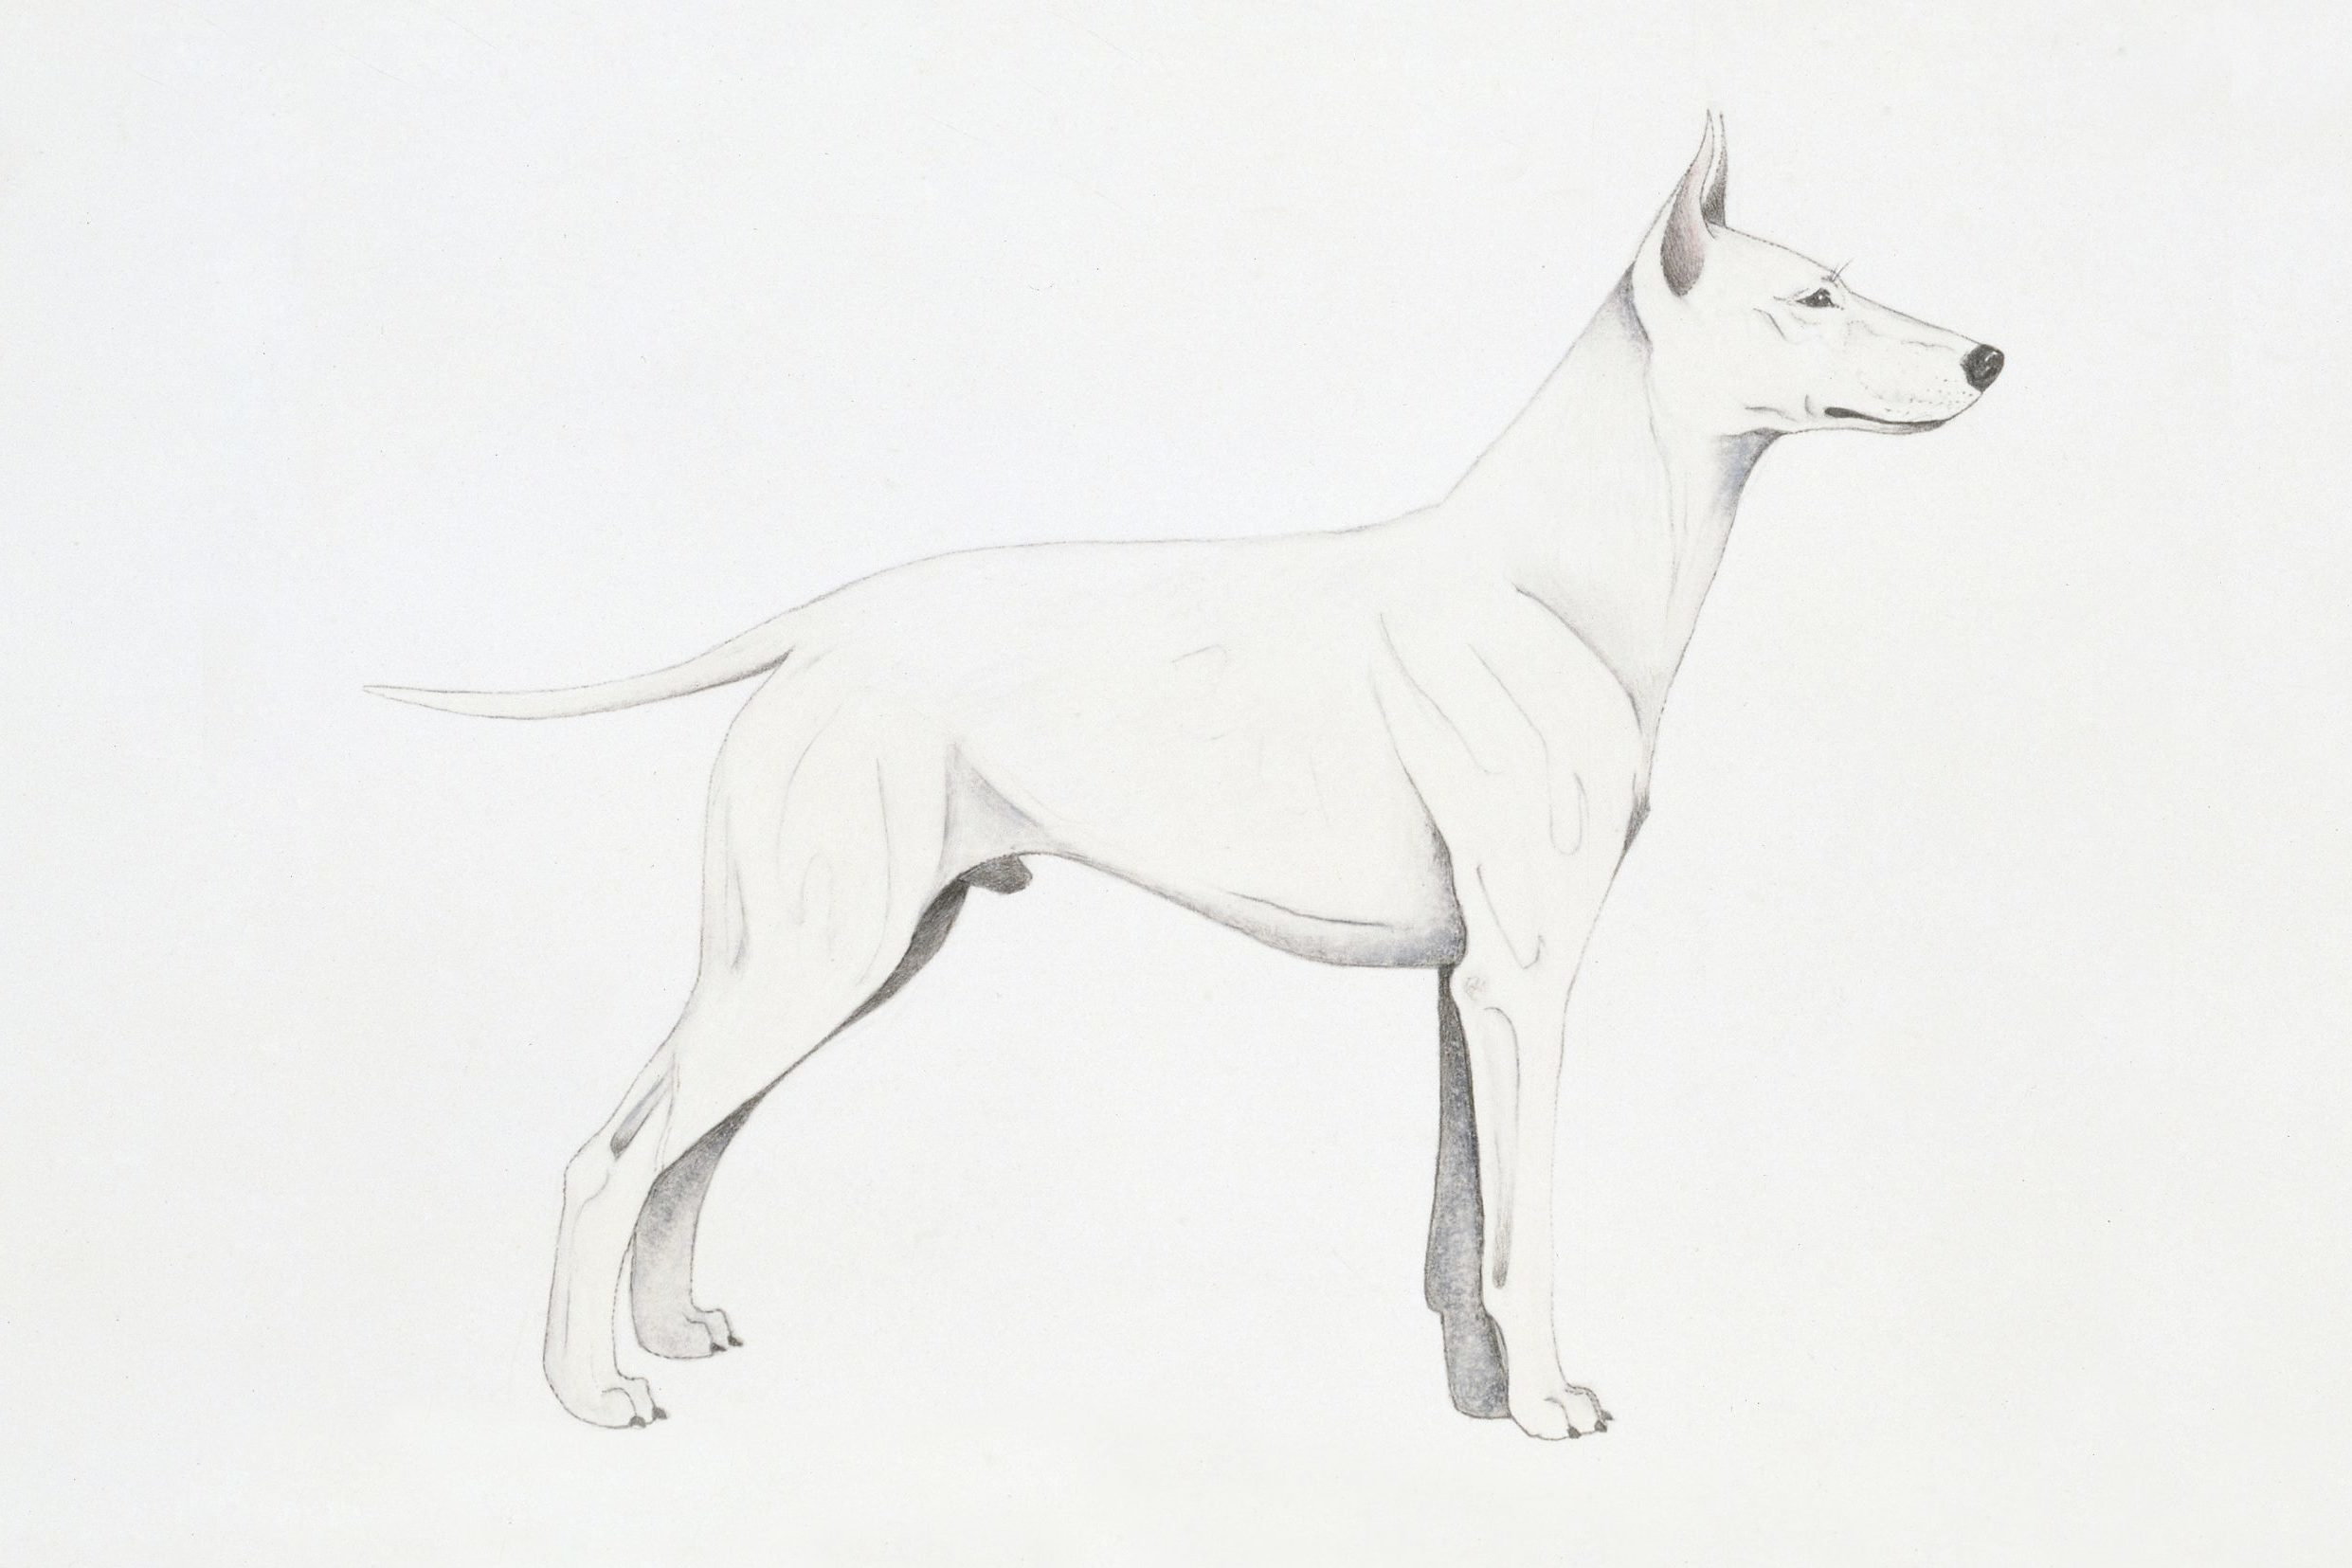 White English Terrier, illustration